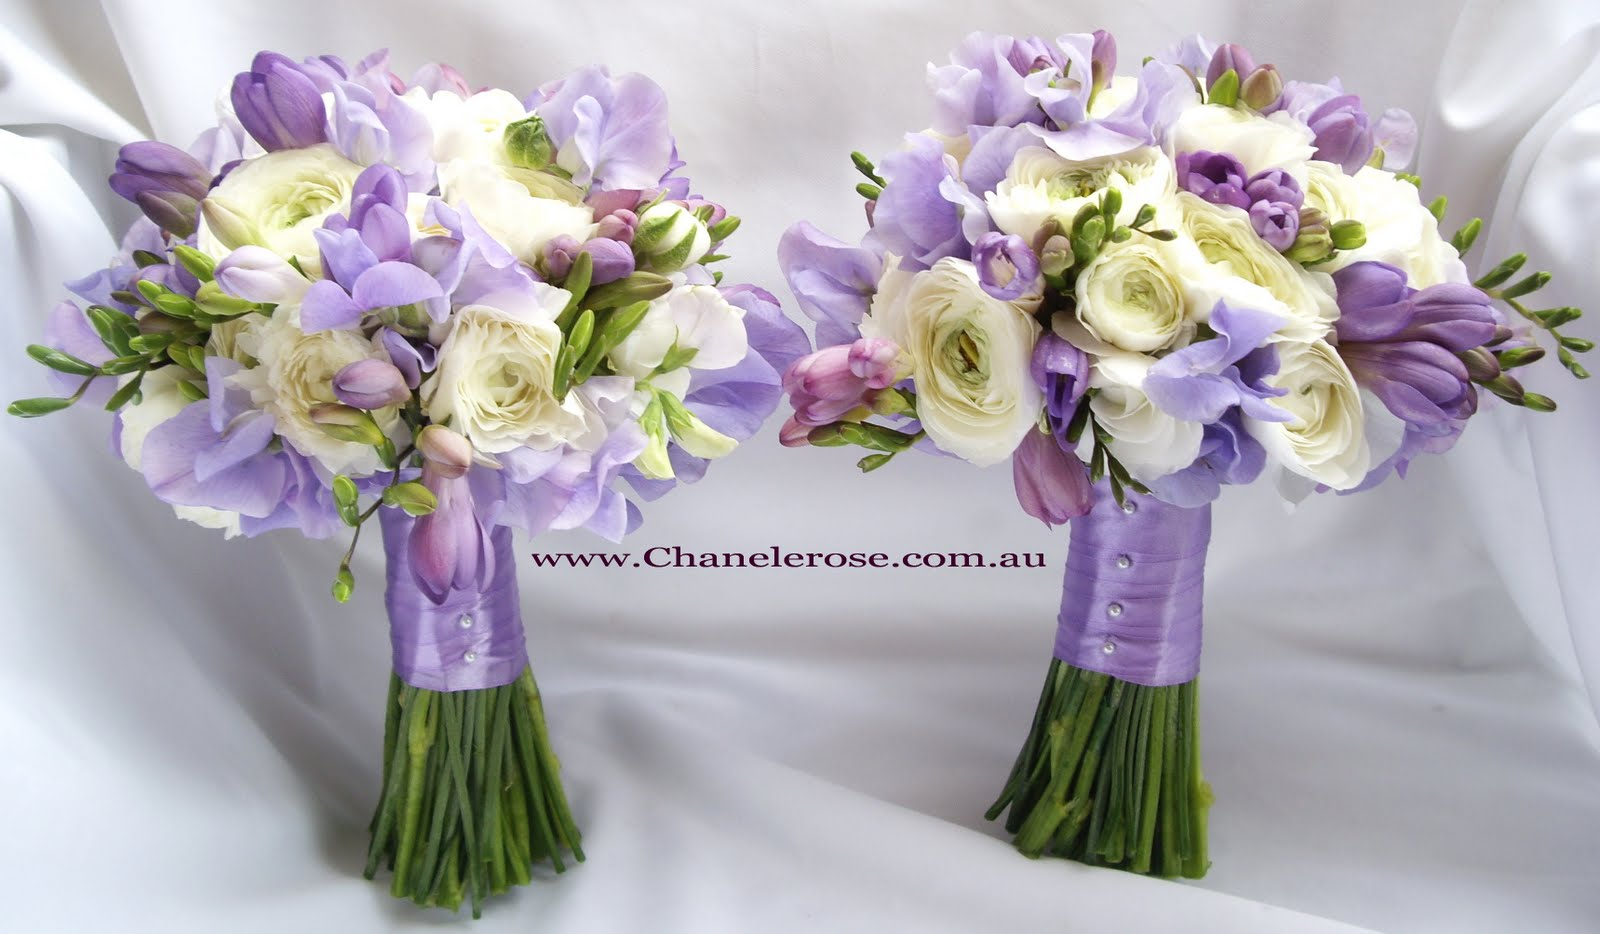 Chanele Rose Flowers Blog Sydney Wedding Stylist Florist Purple Is